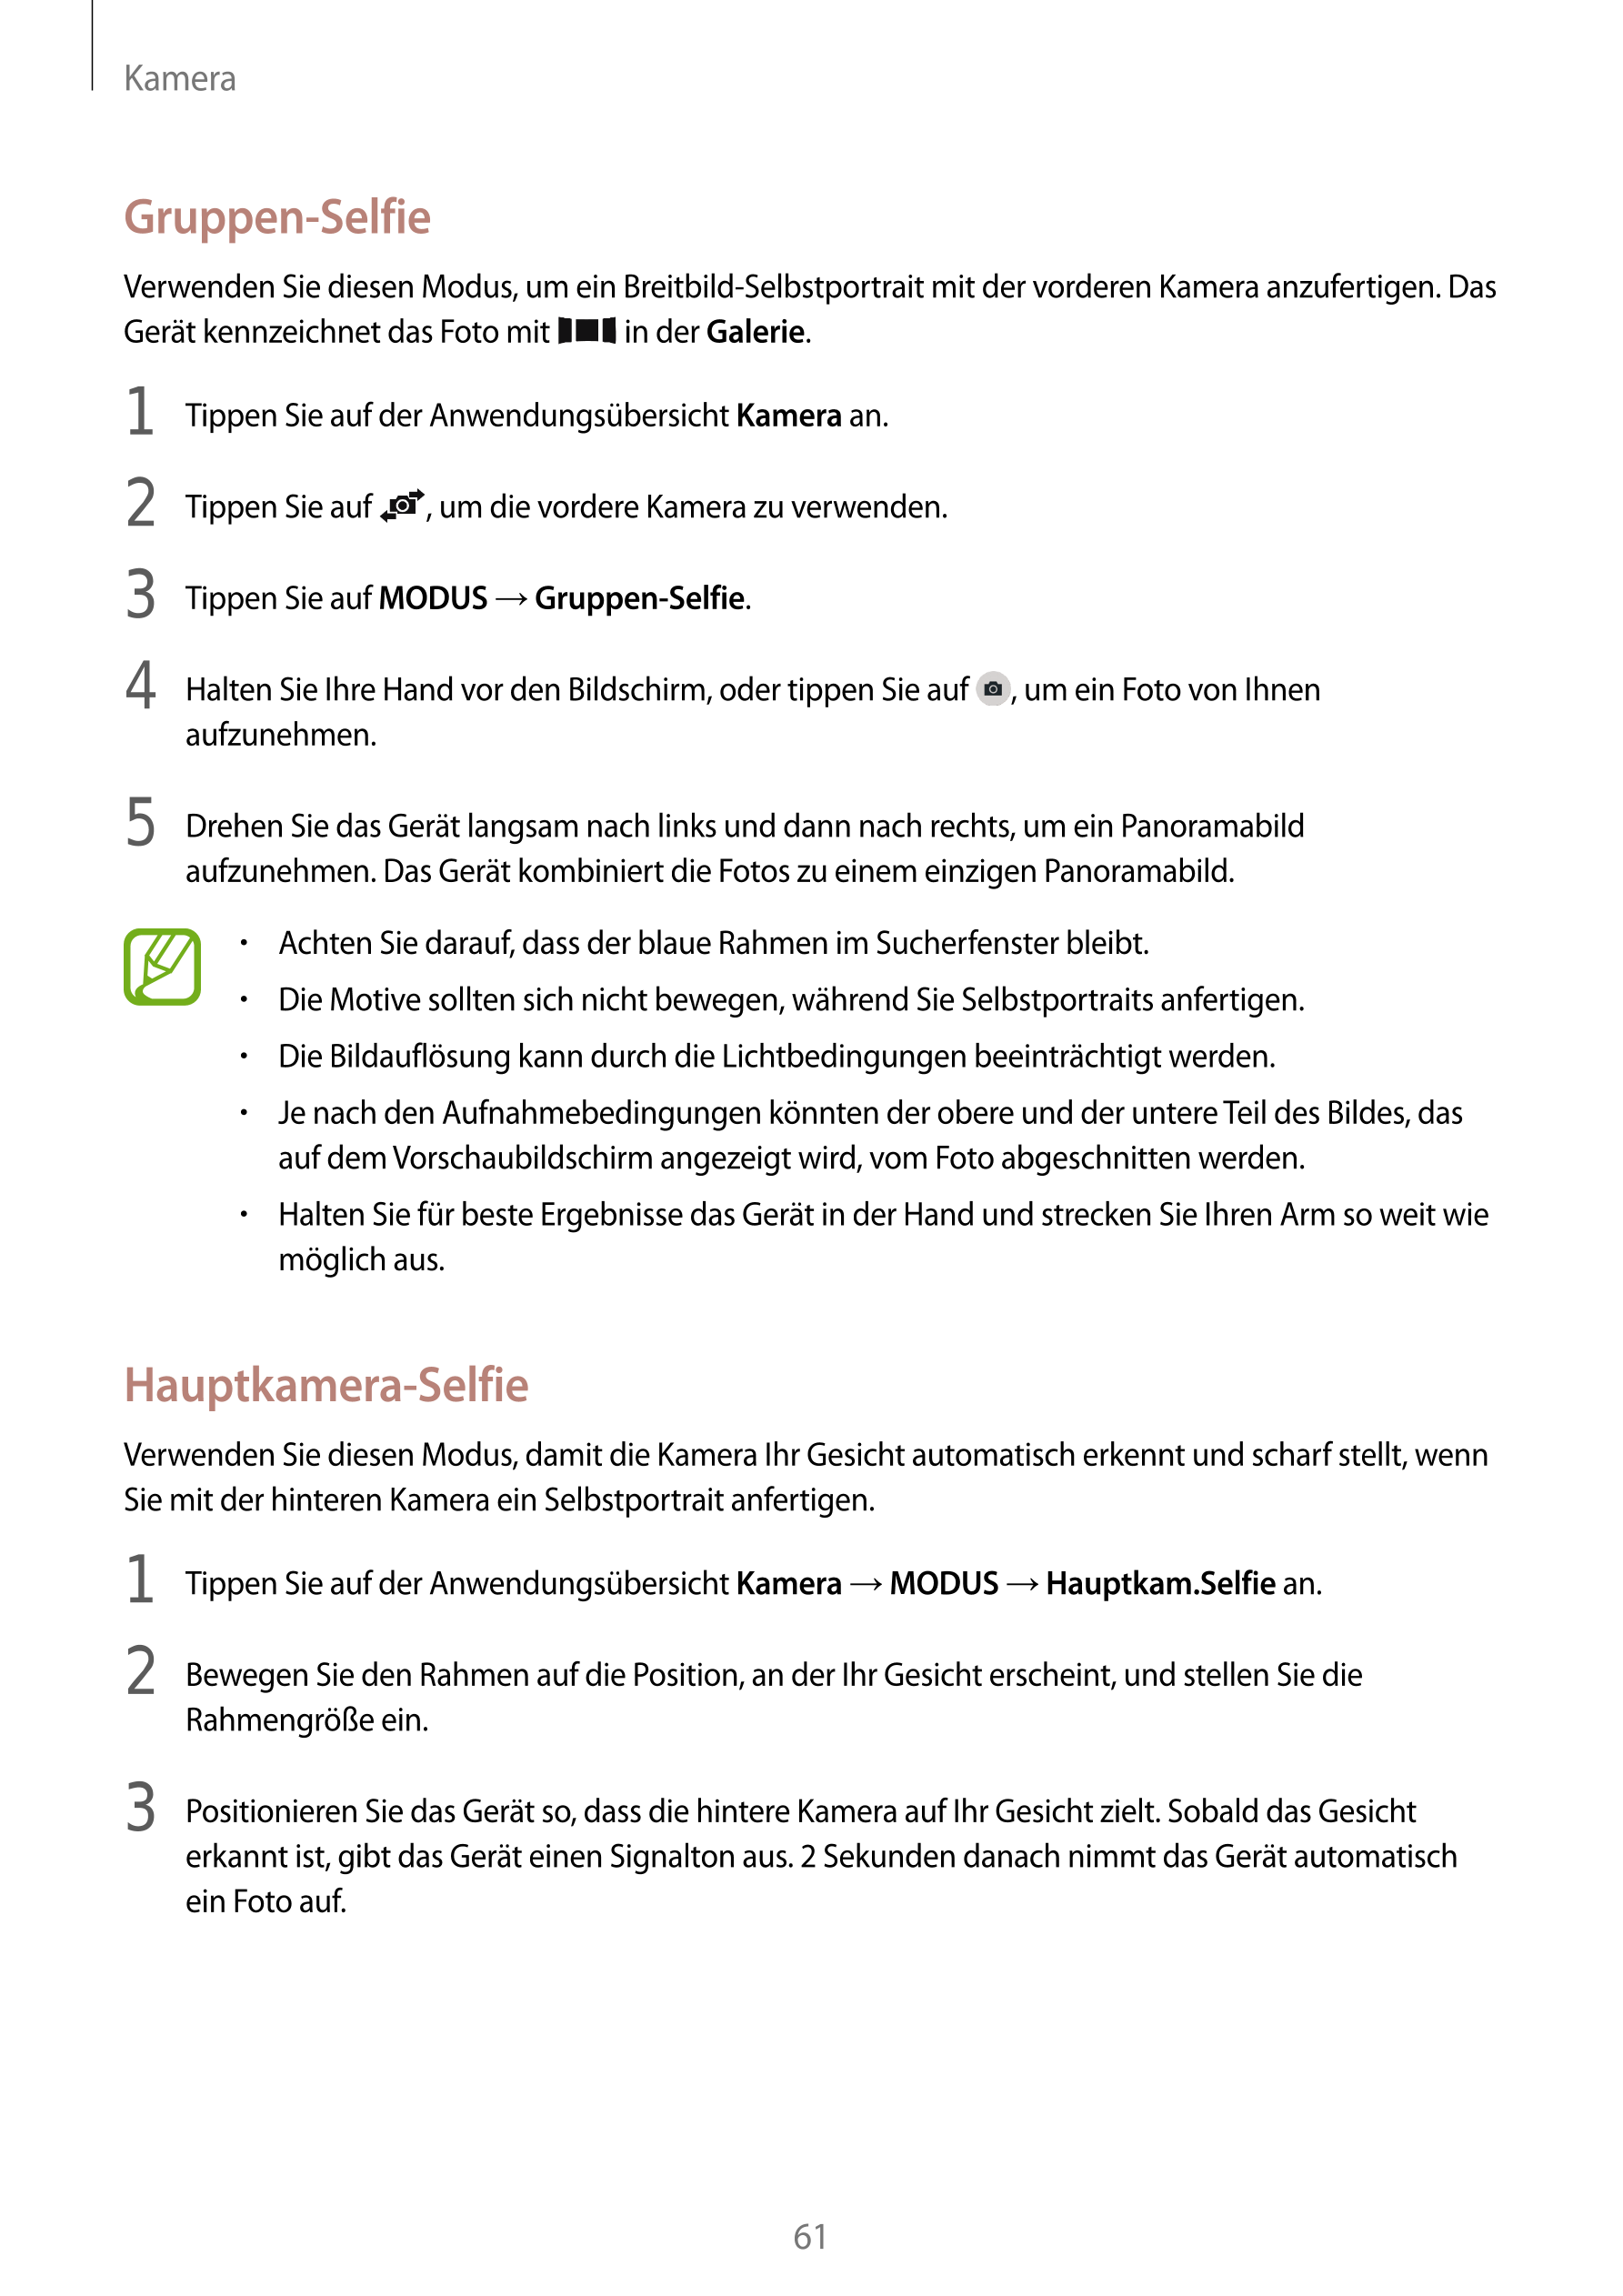 Beste Kã¶nigingrã¶ãÿenbett Rahmen Ziel Bilder - Rahmen Ideen ...